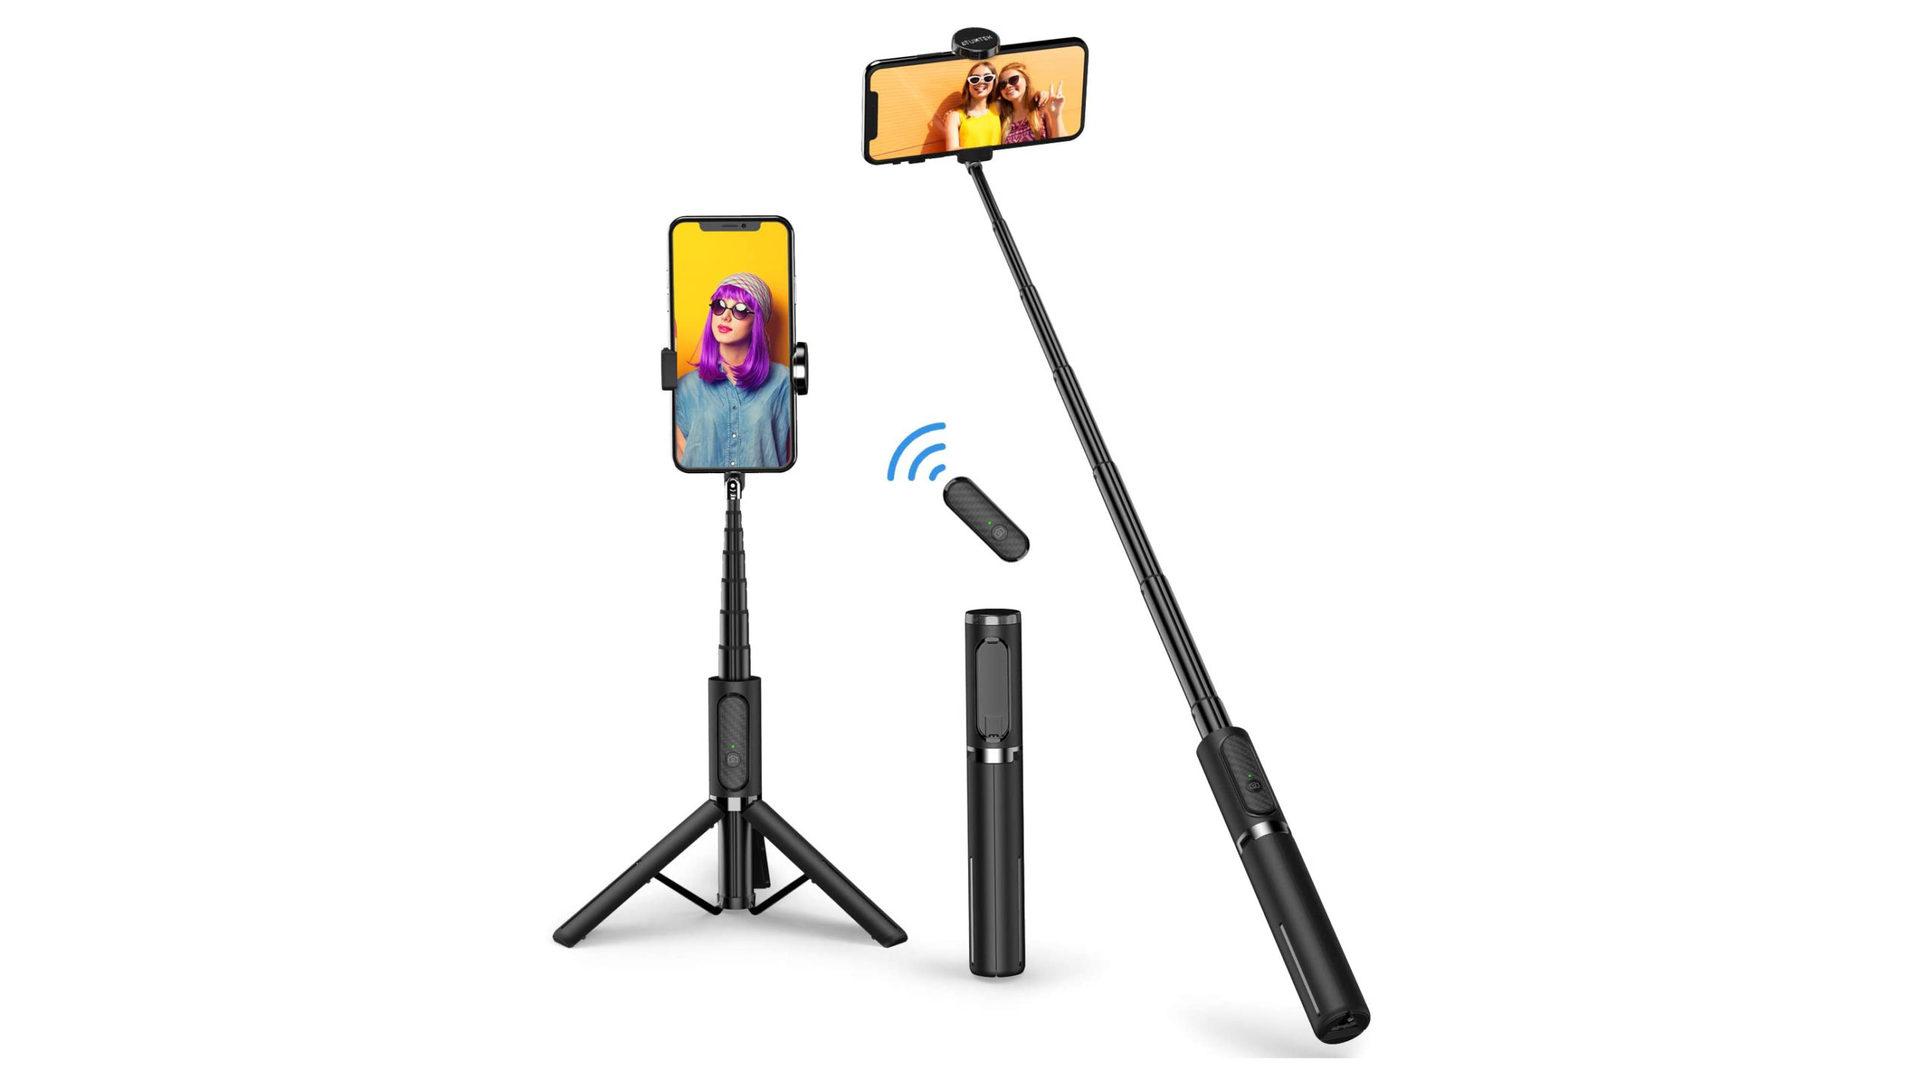 Atumtek Bluetoothj Selfie Stick Tripod